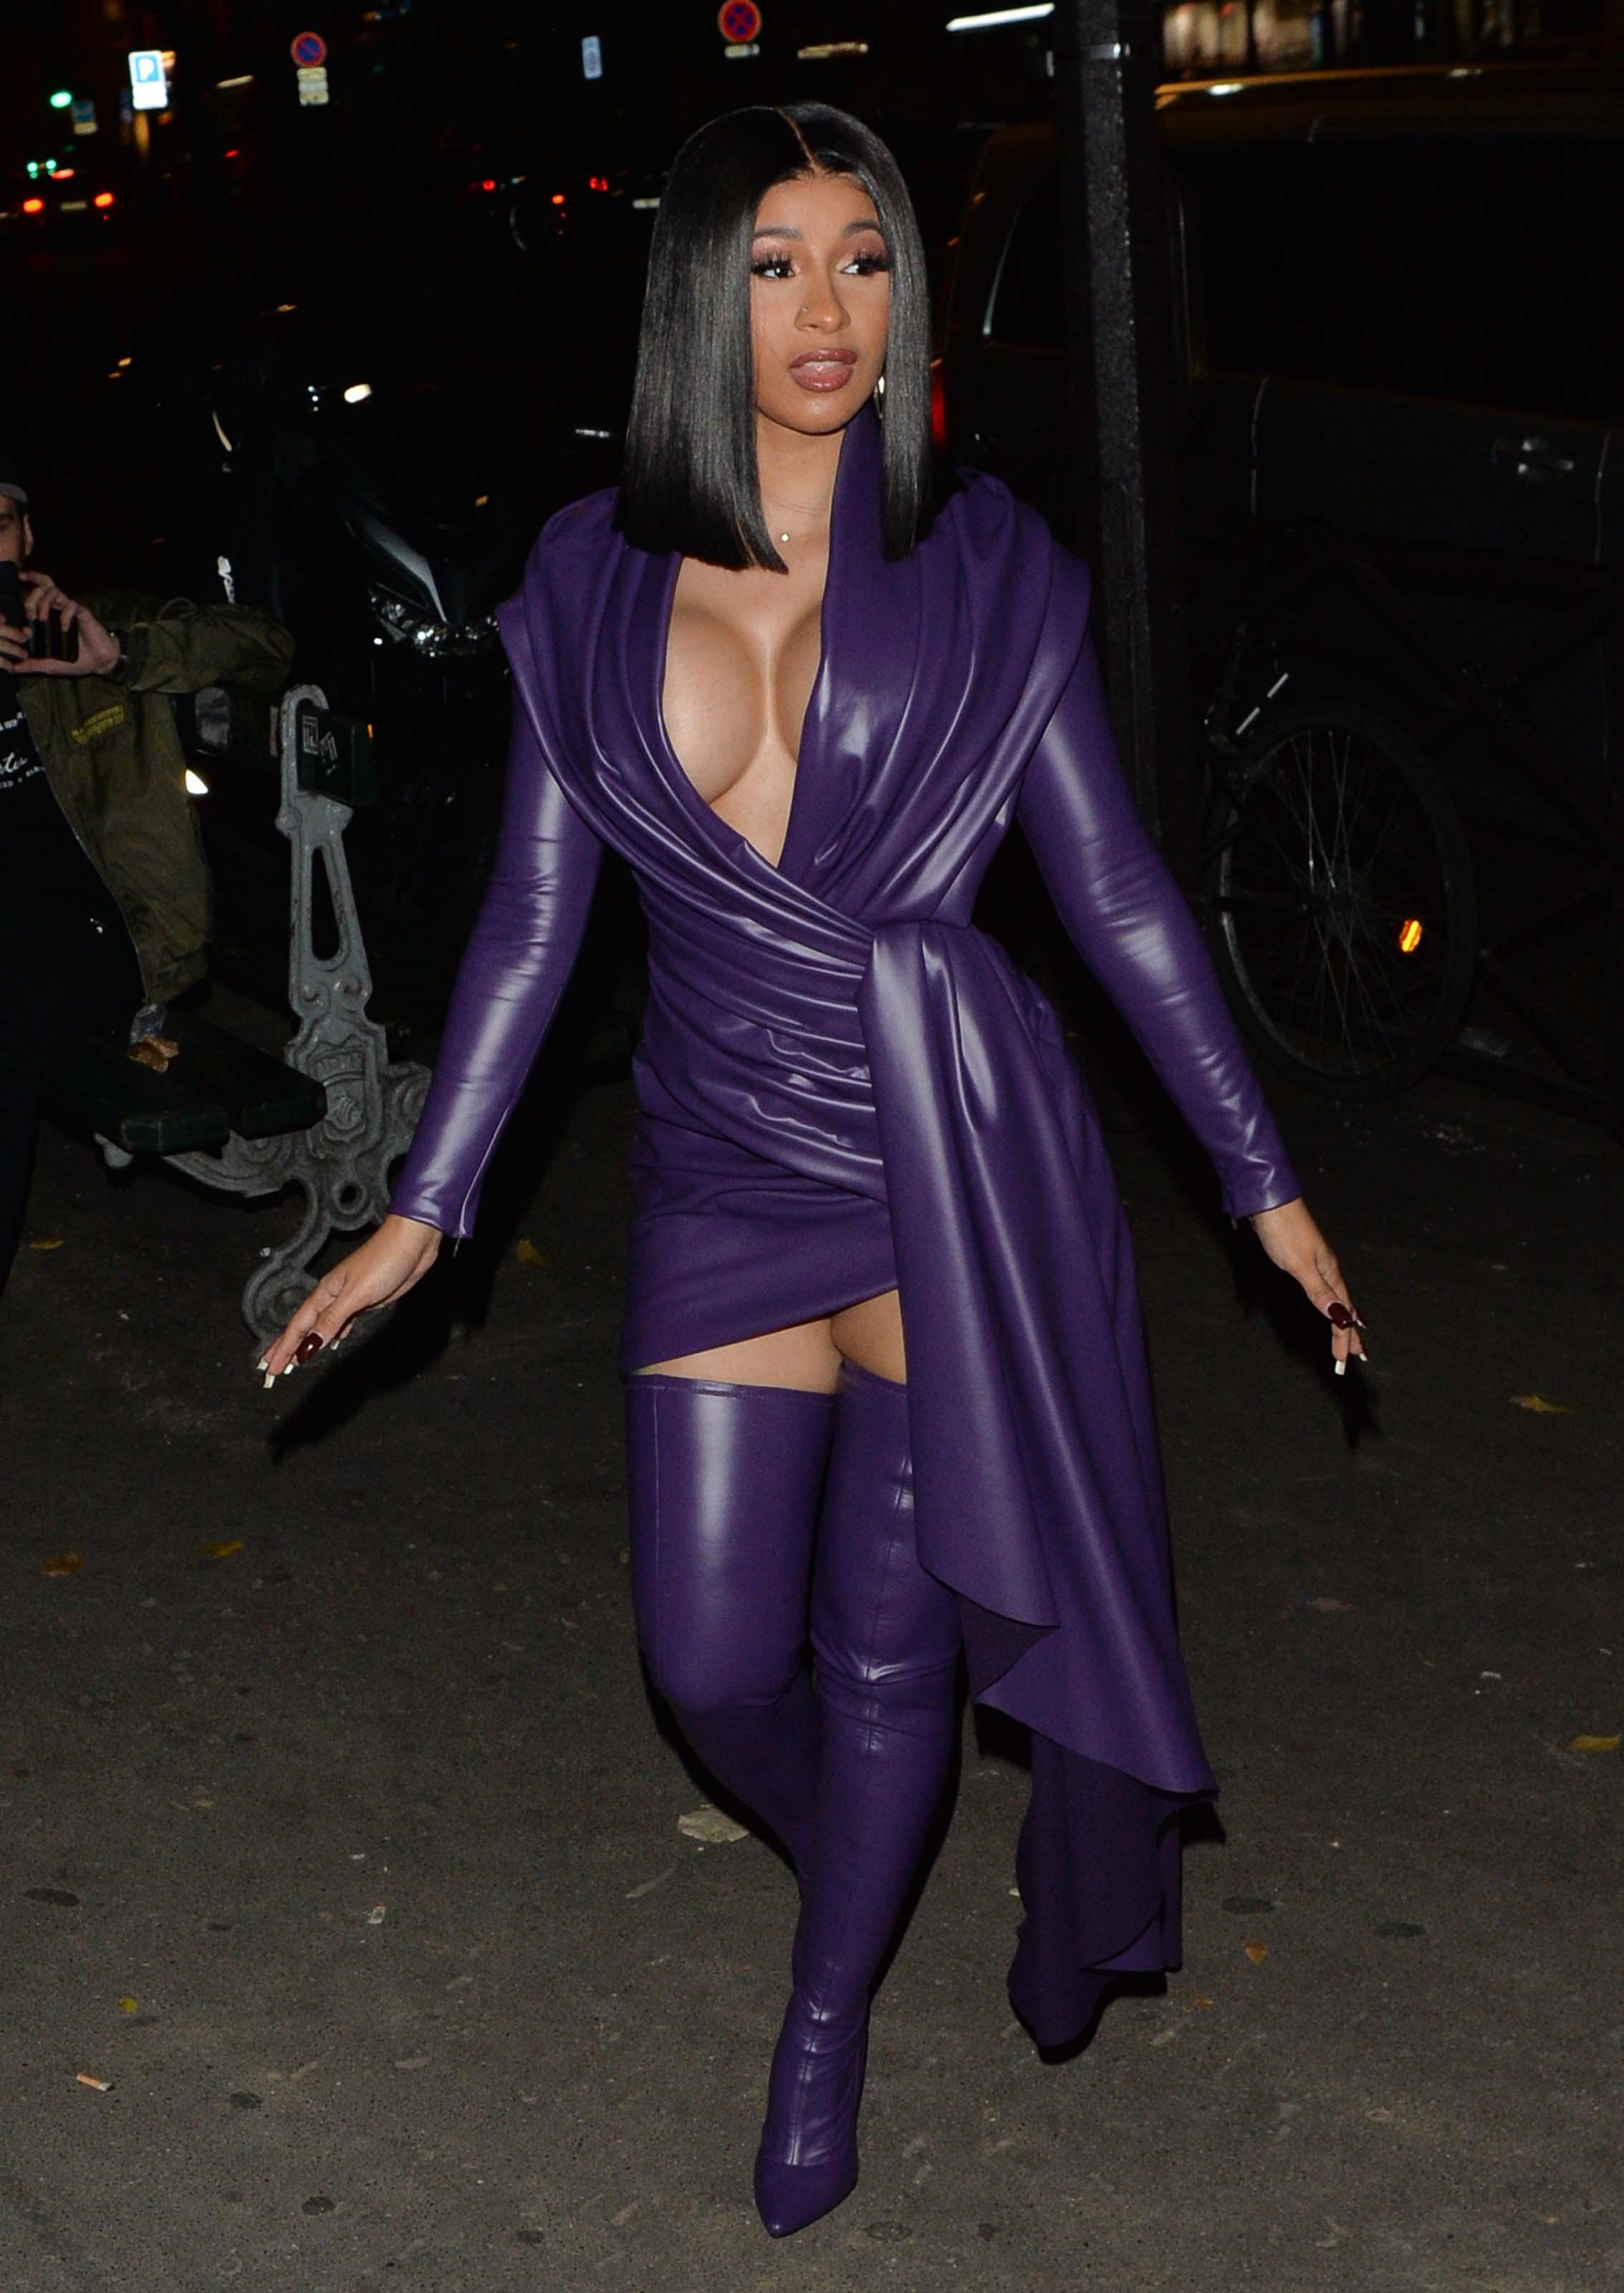 Cardi B night out in Paris